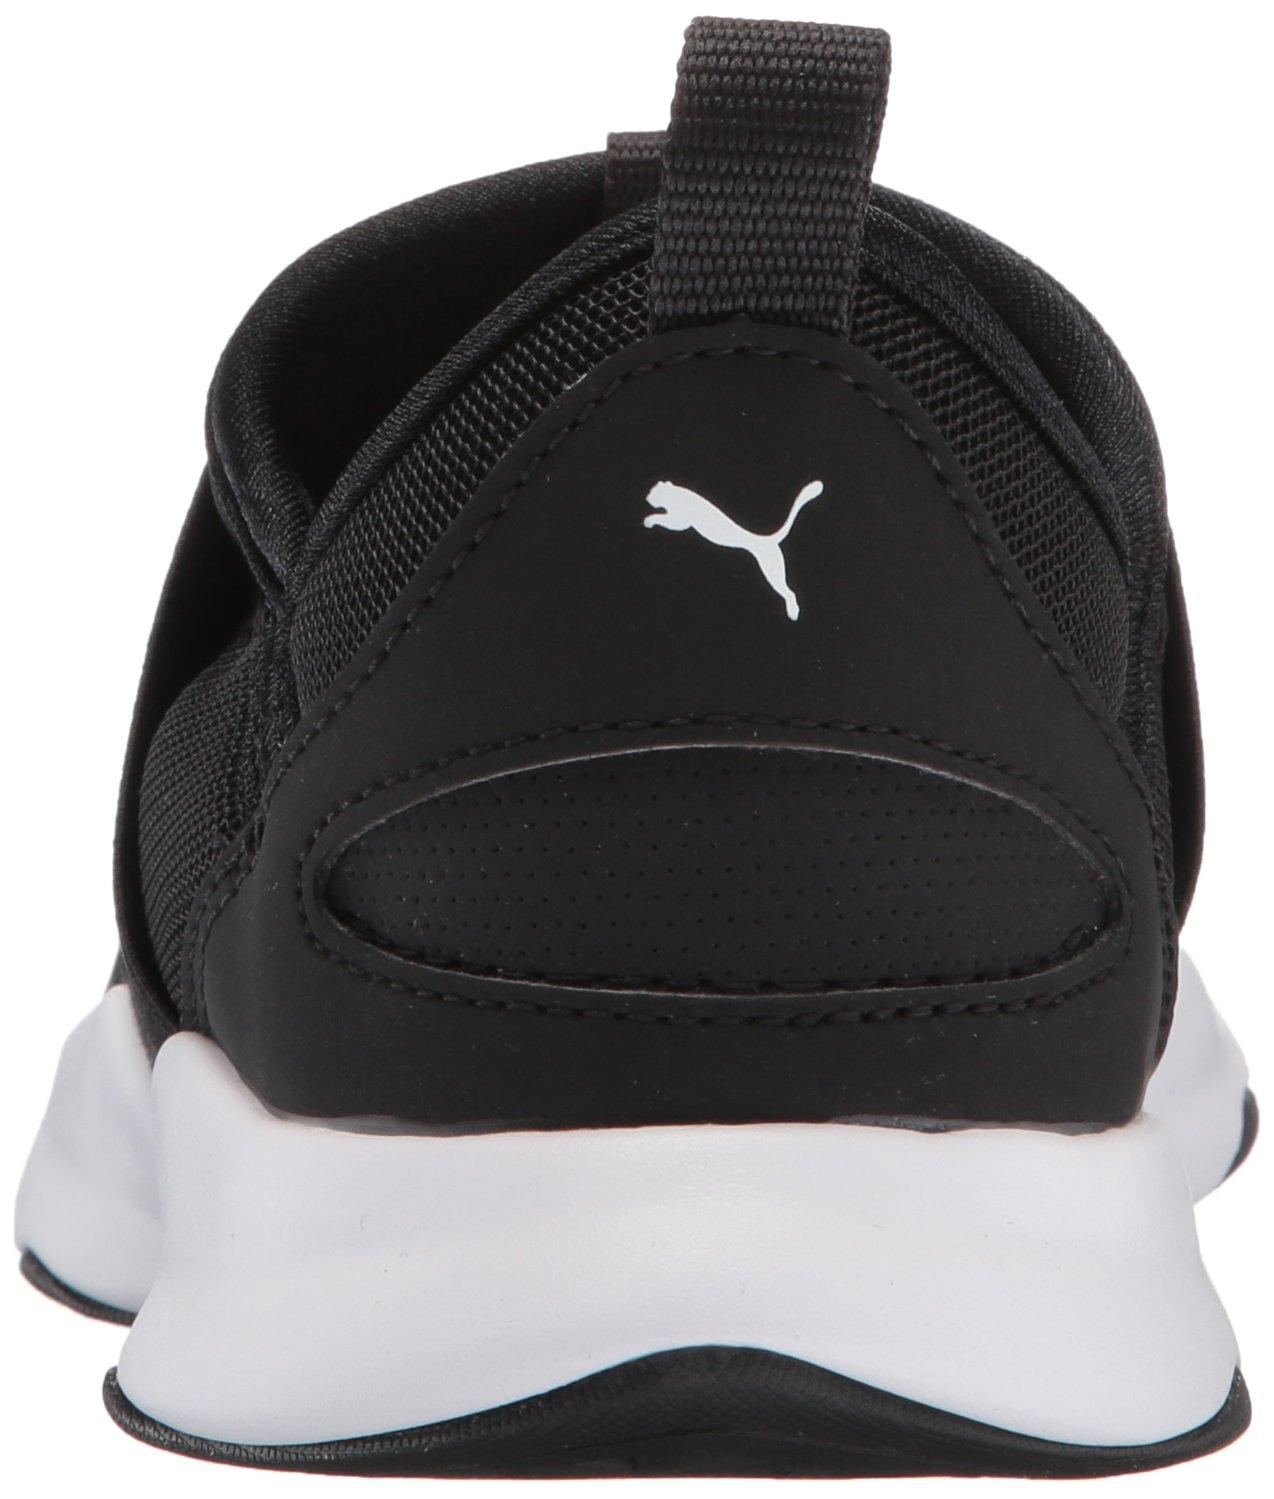 PUMA Women's Dare Sneaker Black-puma B01MXYQT01 11 M US Puma Black-puma Sneaker White 963403